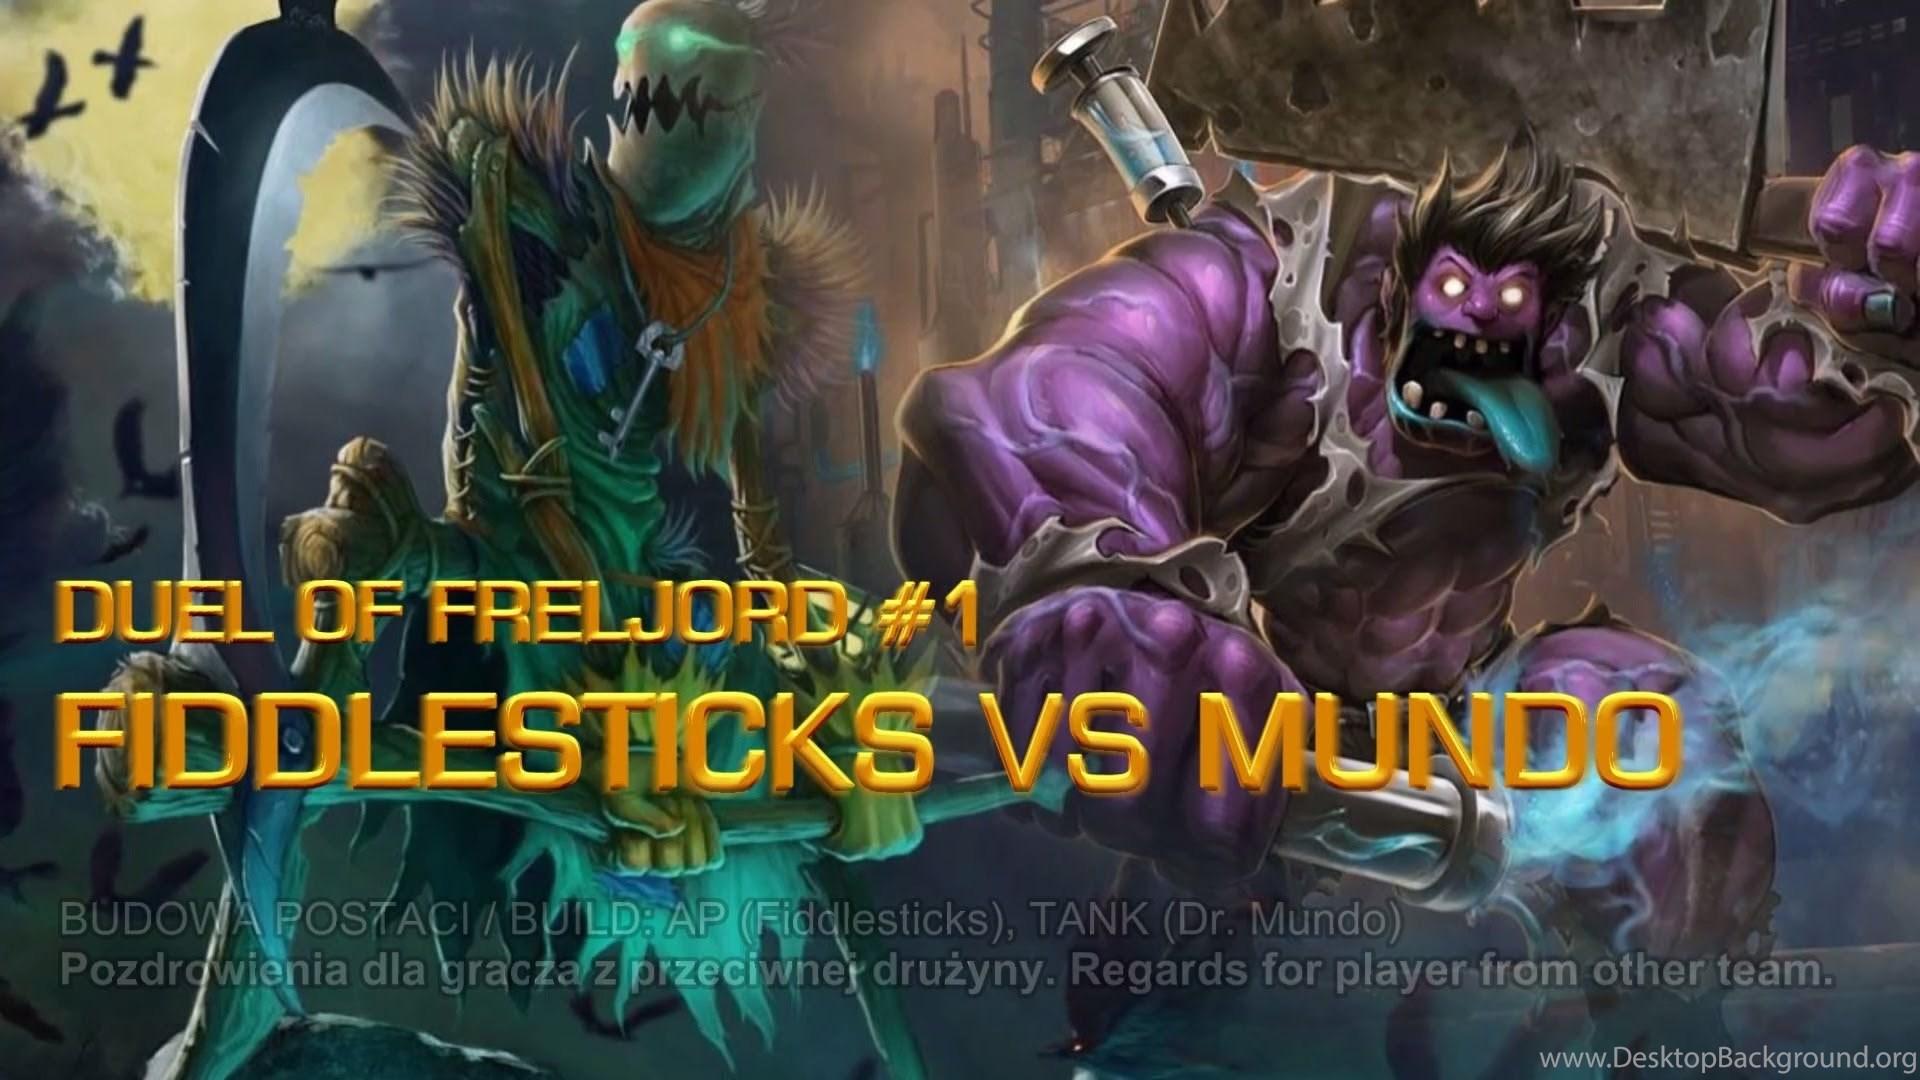 Lol Fiddlesticks Vs Dr Mundo League Of Legends Summoners Duel